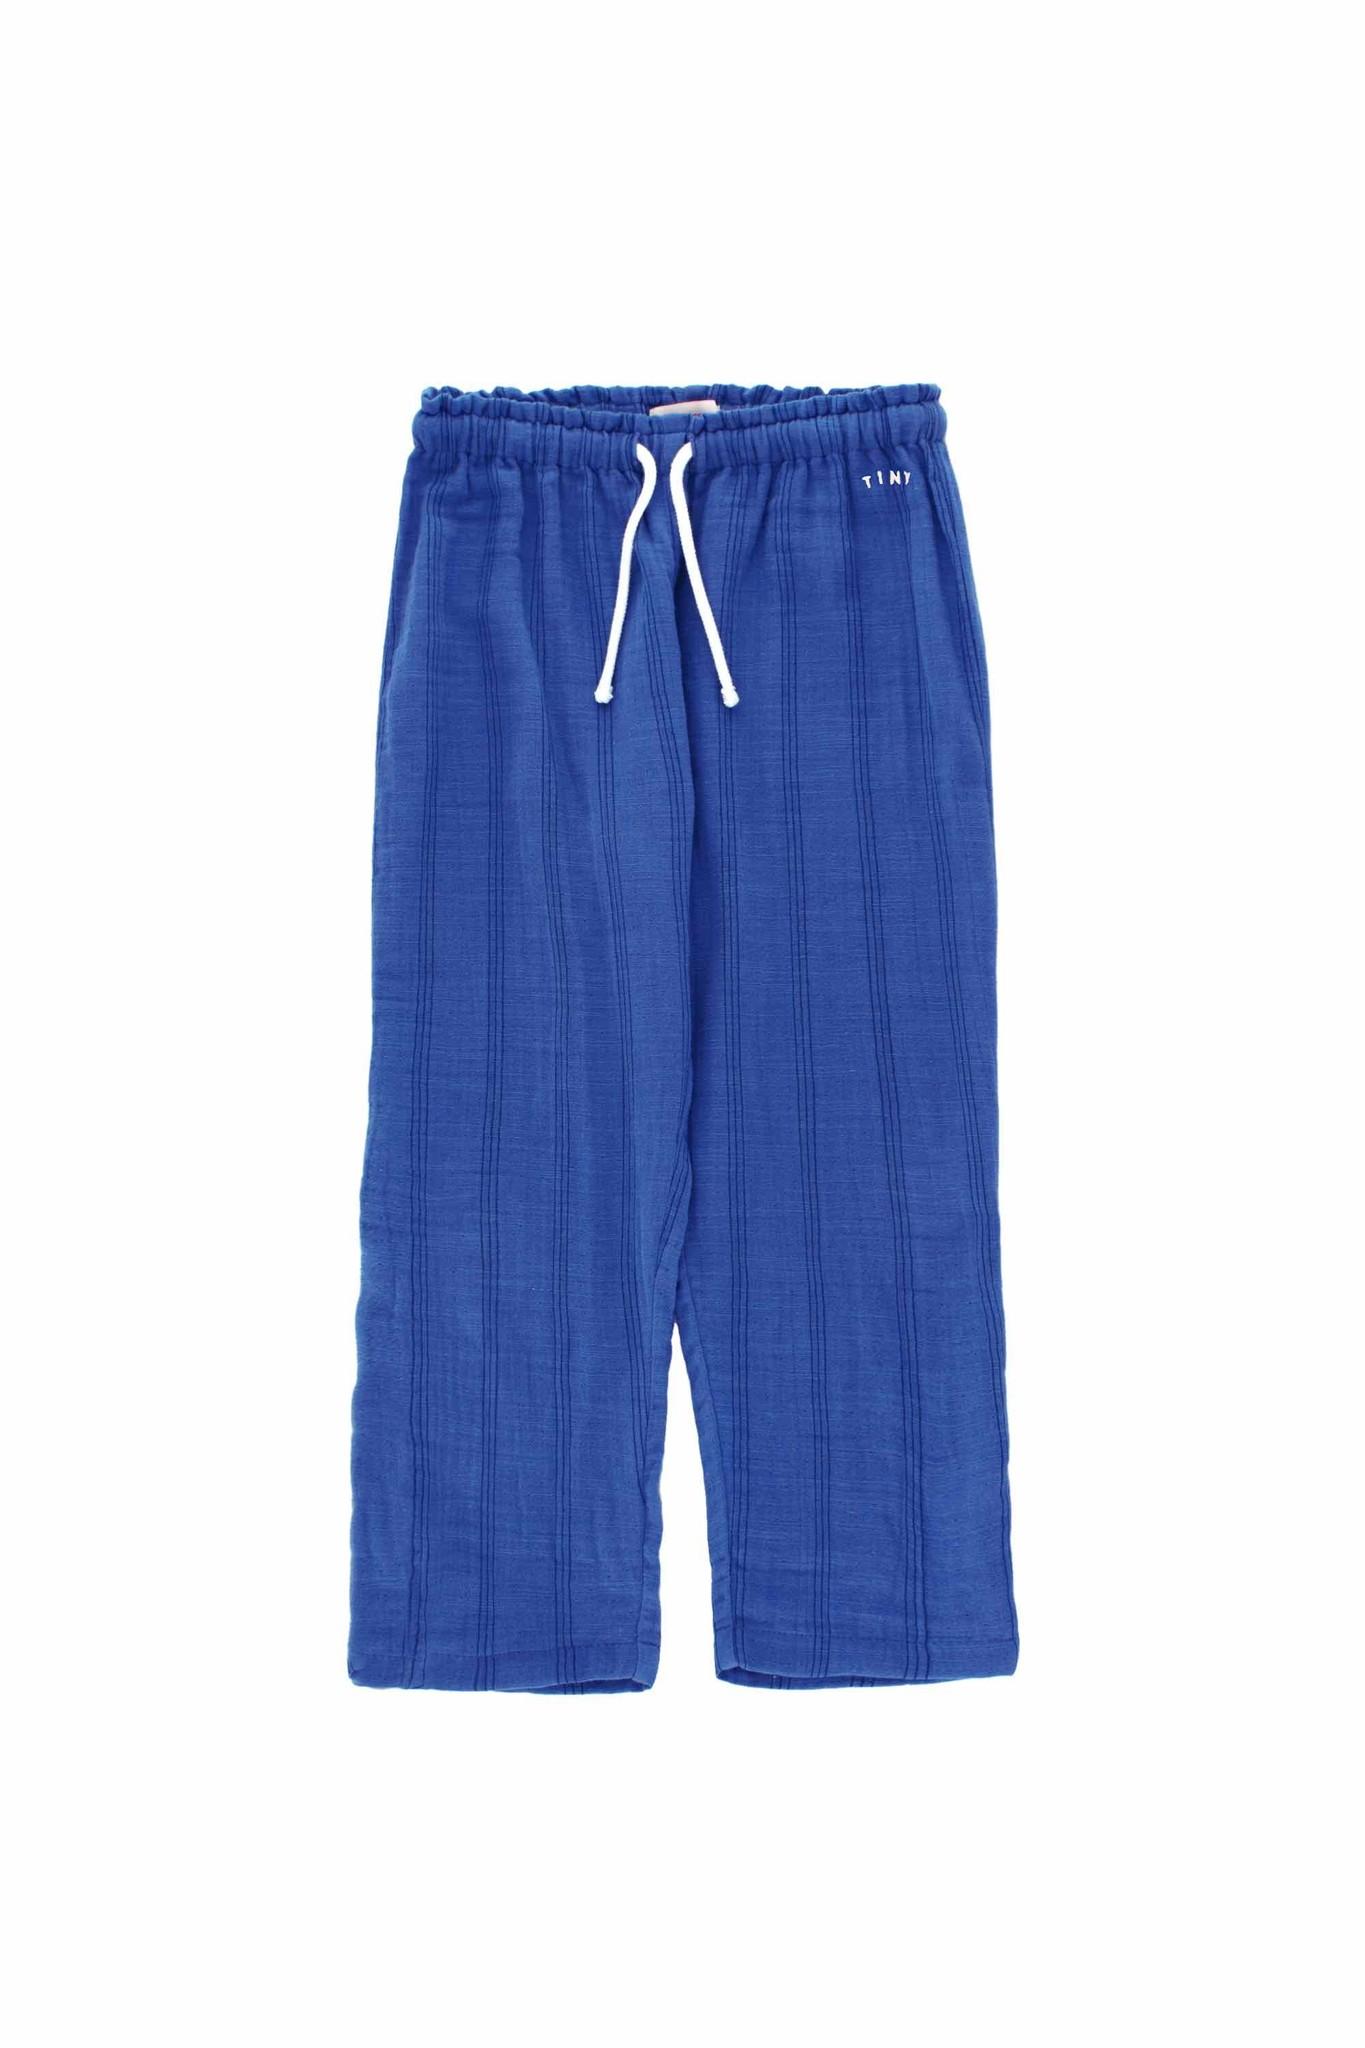 Stripes Tiny pant - Iris Blue / Ink Blue-1